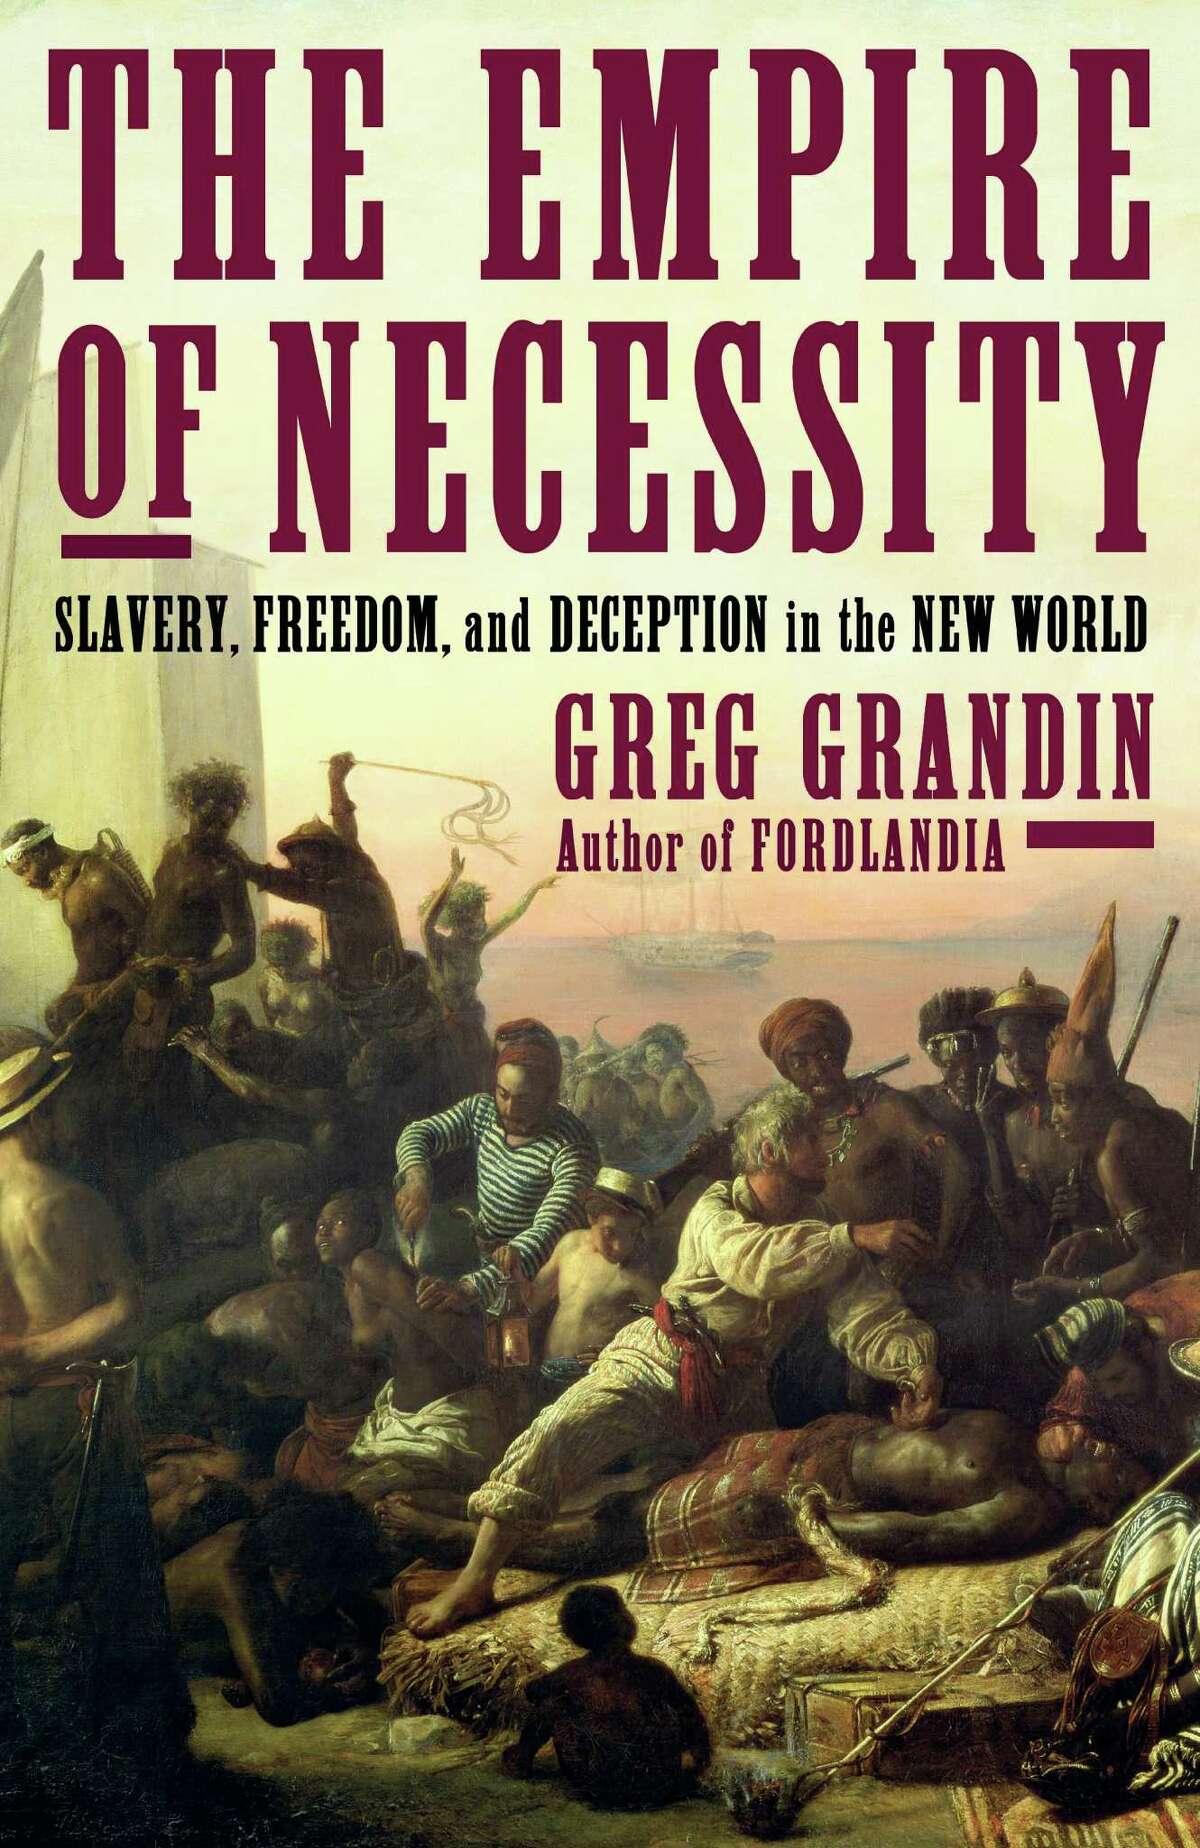 The Empire of Necessity, by Greg Grandin